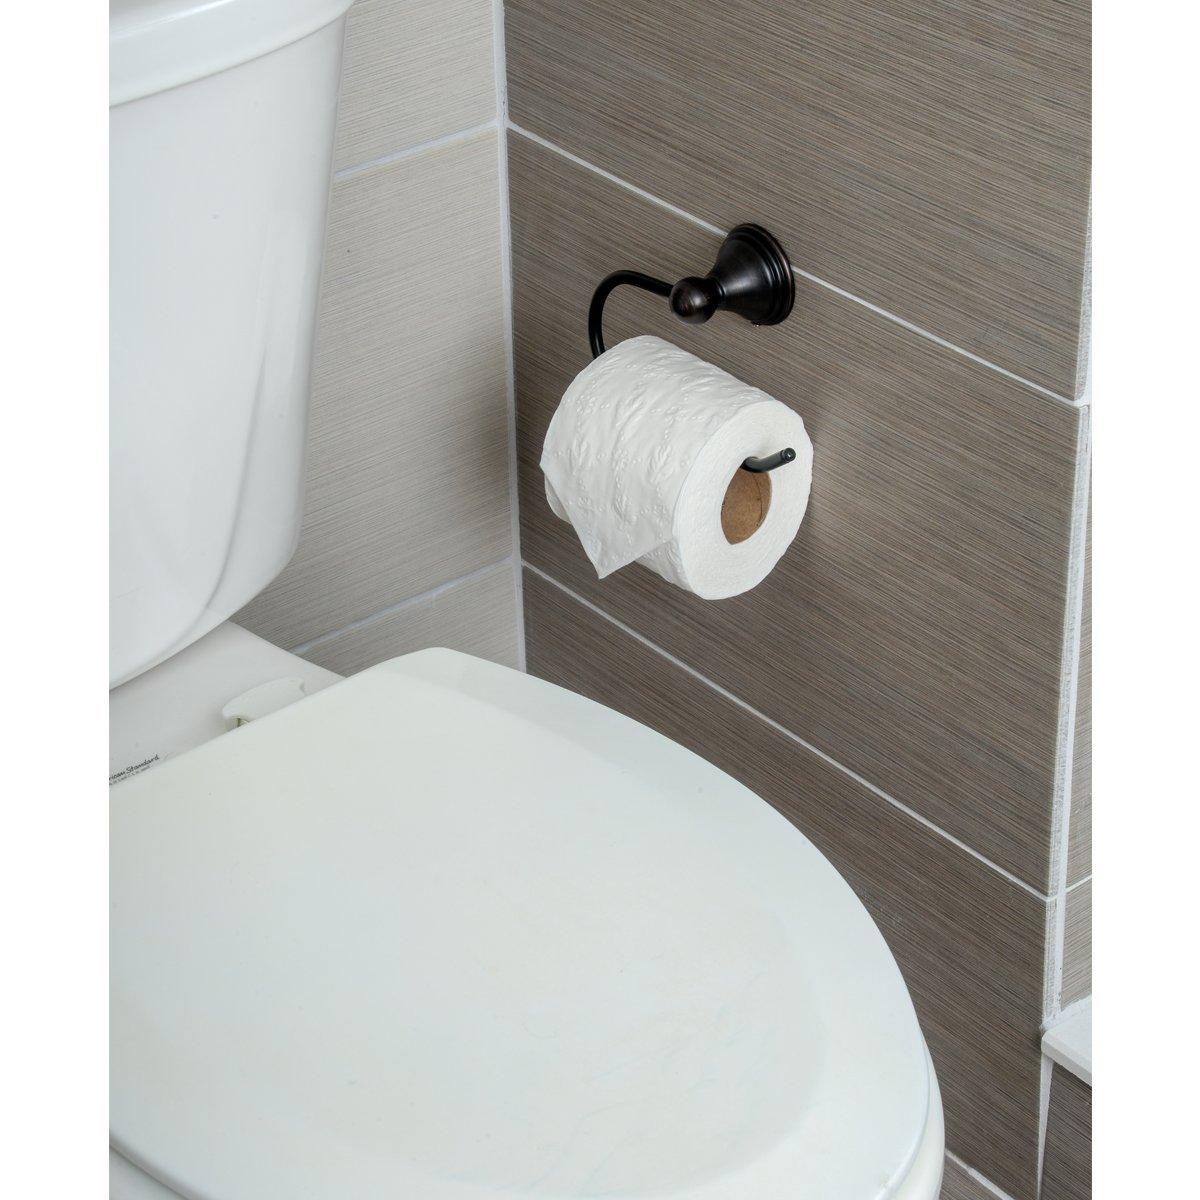 Nickel satin/é Basics Porte-papier toilette Traditionnel standard